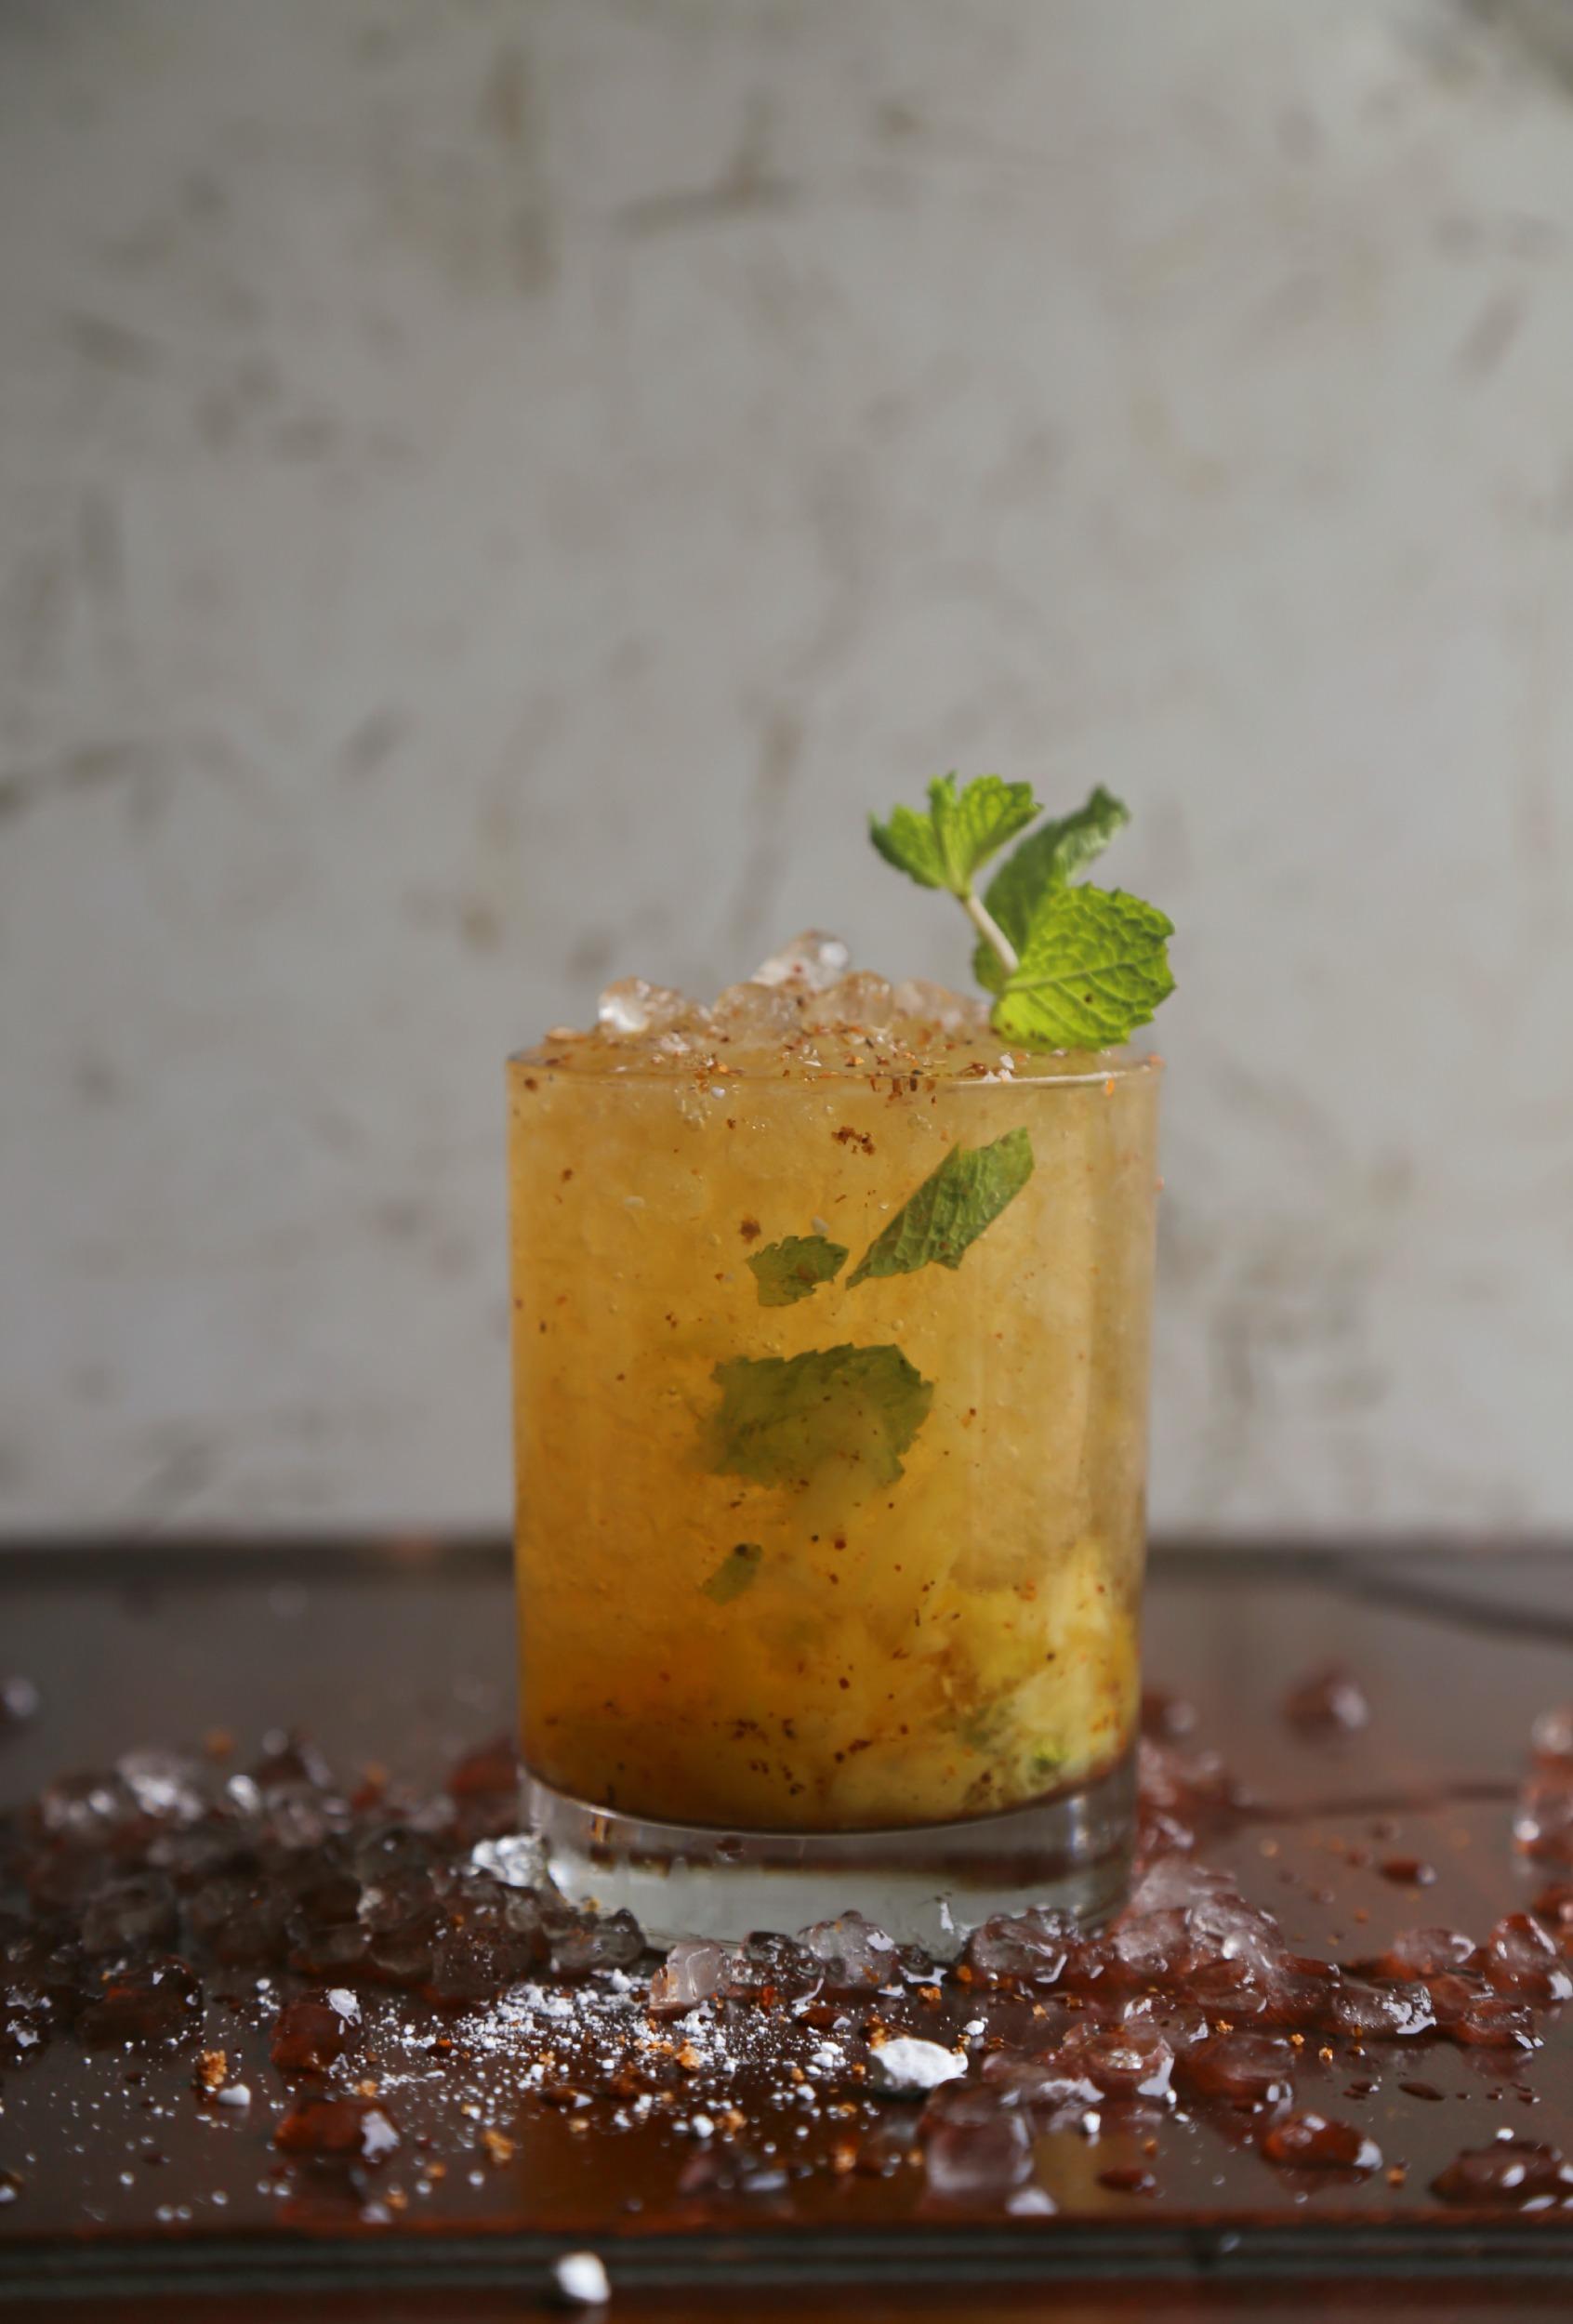 mango-chile-mint-julep-VianneyRodriguez-sweetlifebake